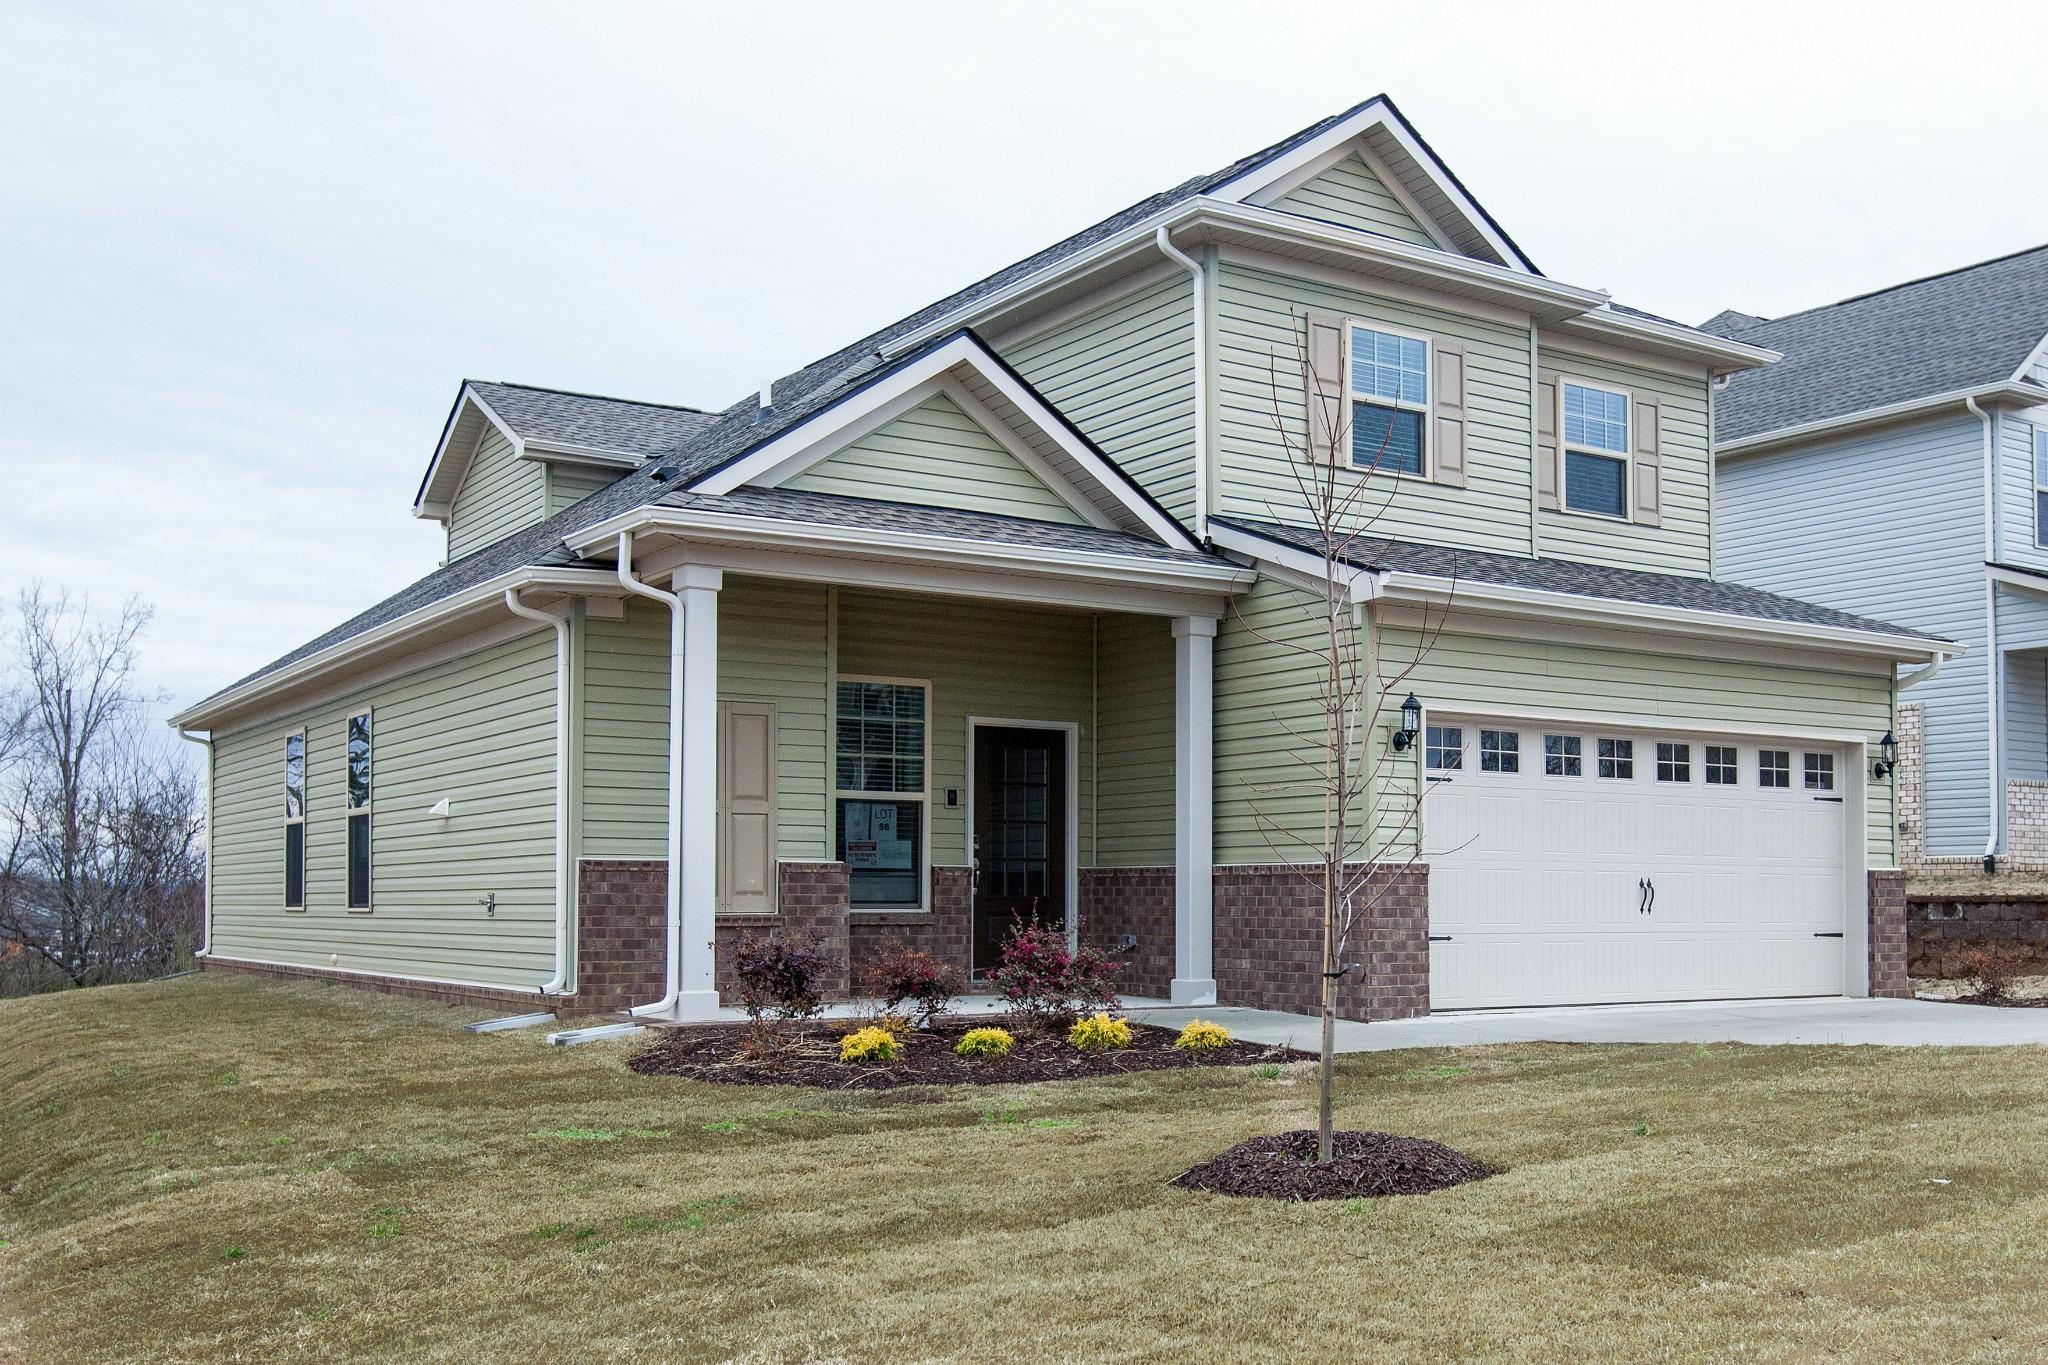 322 Cloverbrook Way, Gallatin, TN 37066 - Gallatin, TN real estate listing